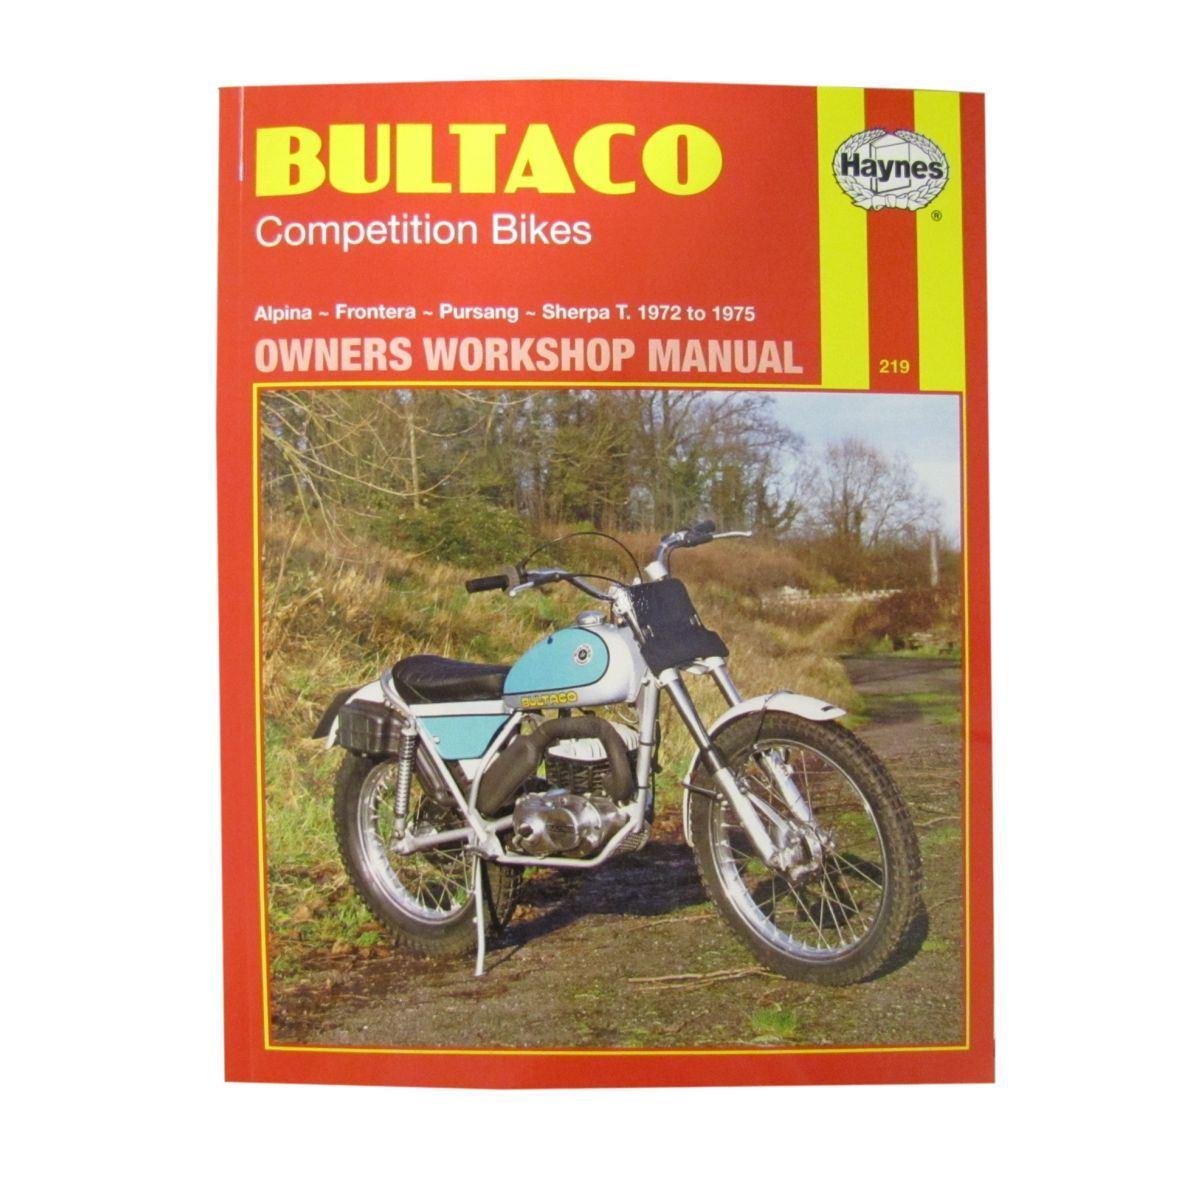 Image is loading Workshop-Manual-Bultaco-Alpina-Frontera-Pursang-Sherpa-T-